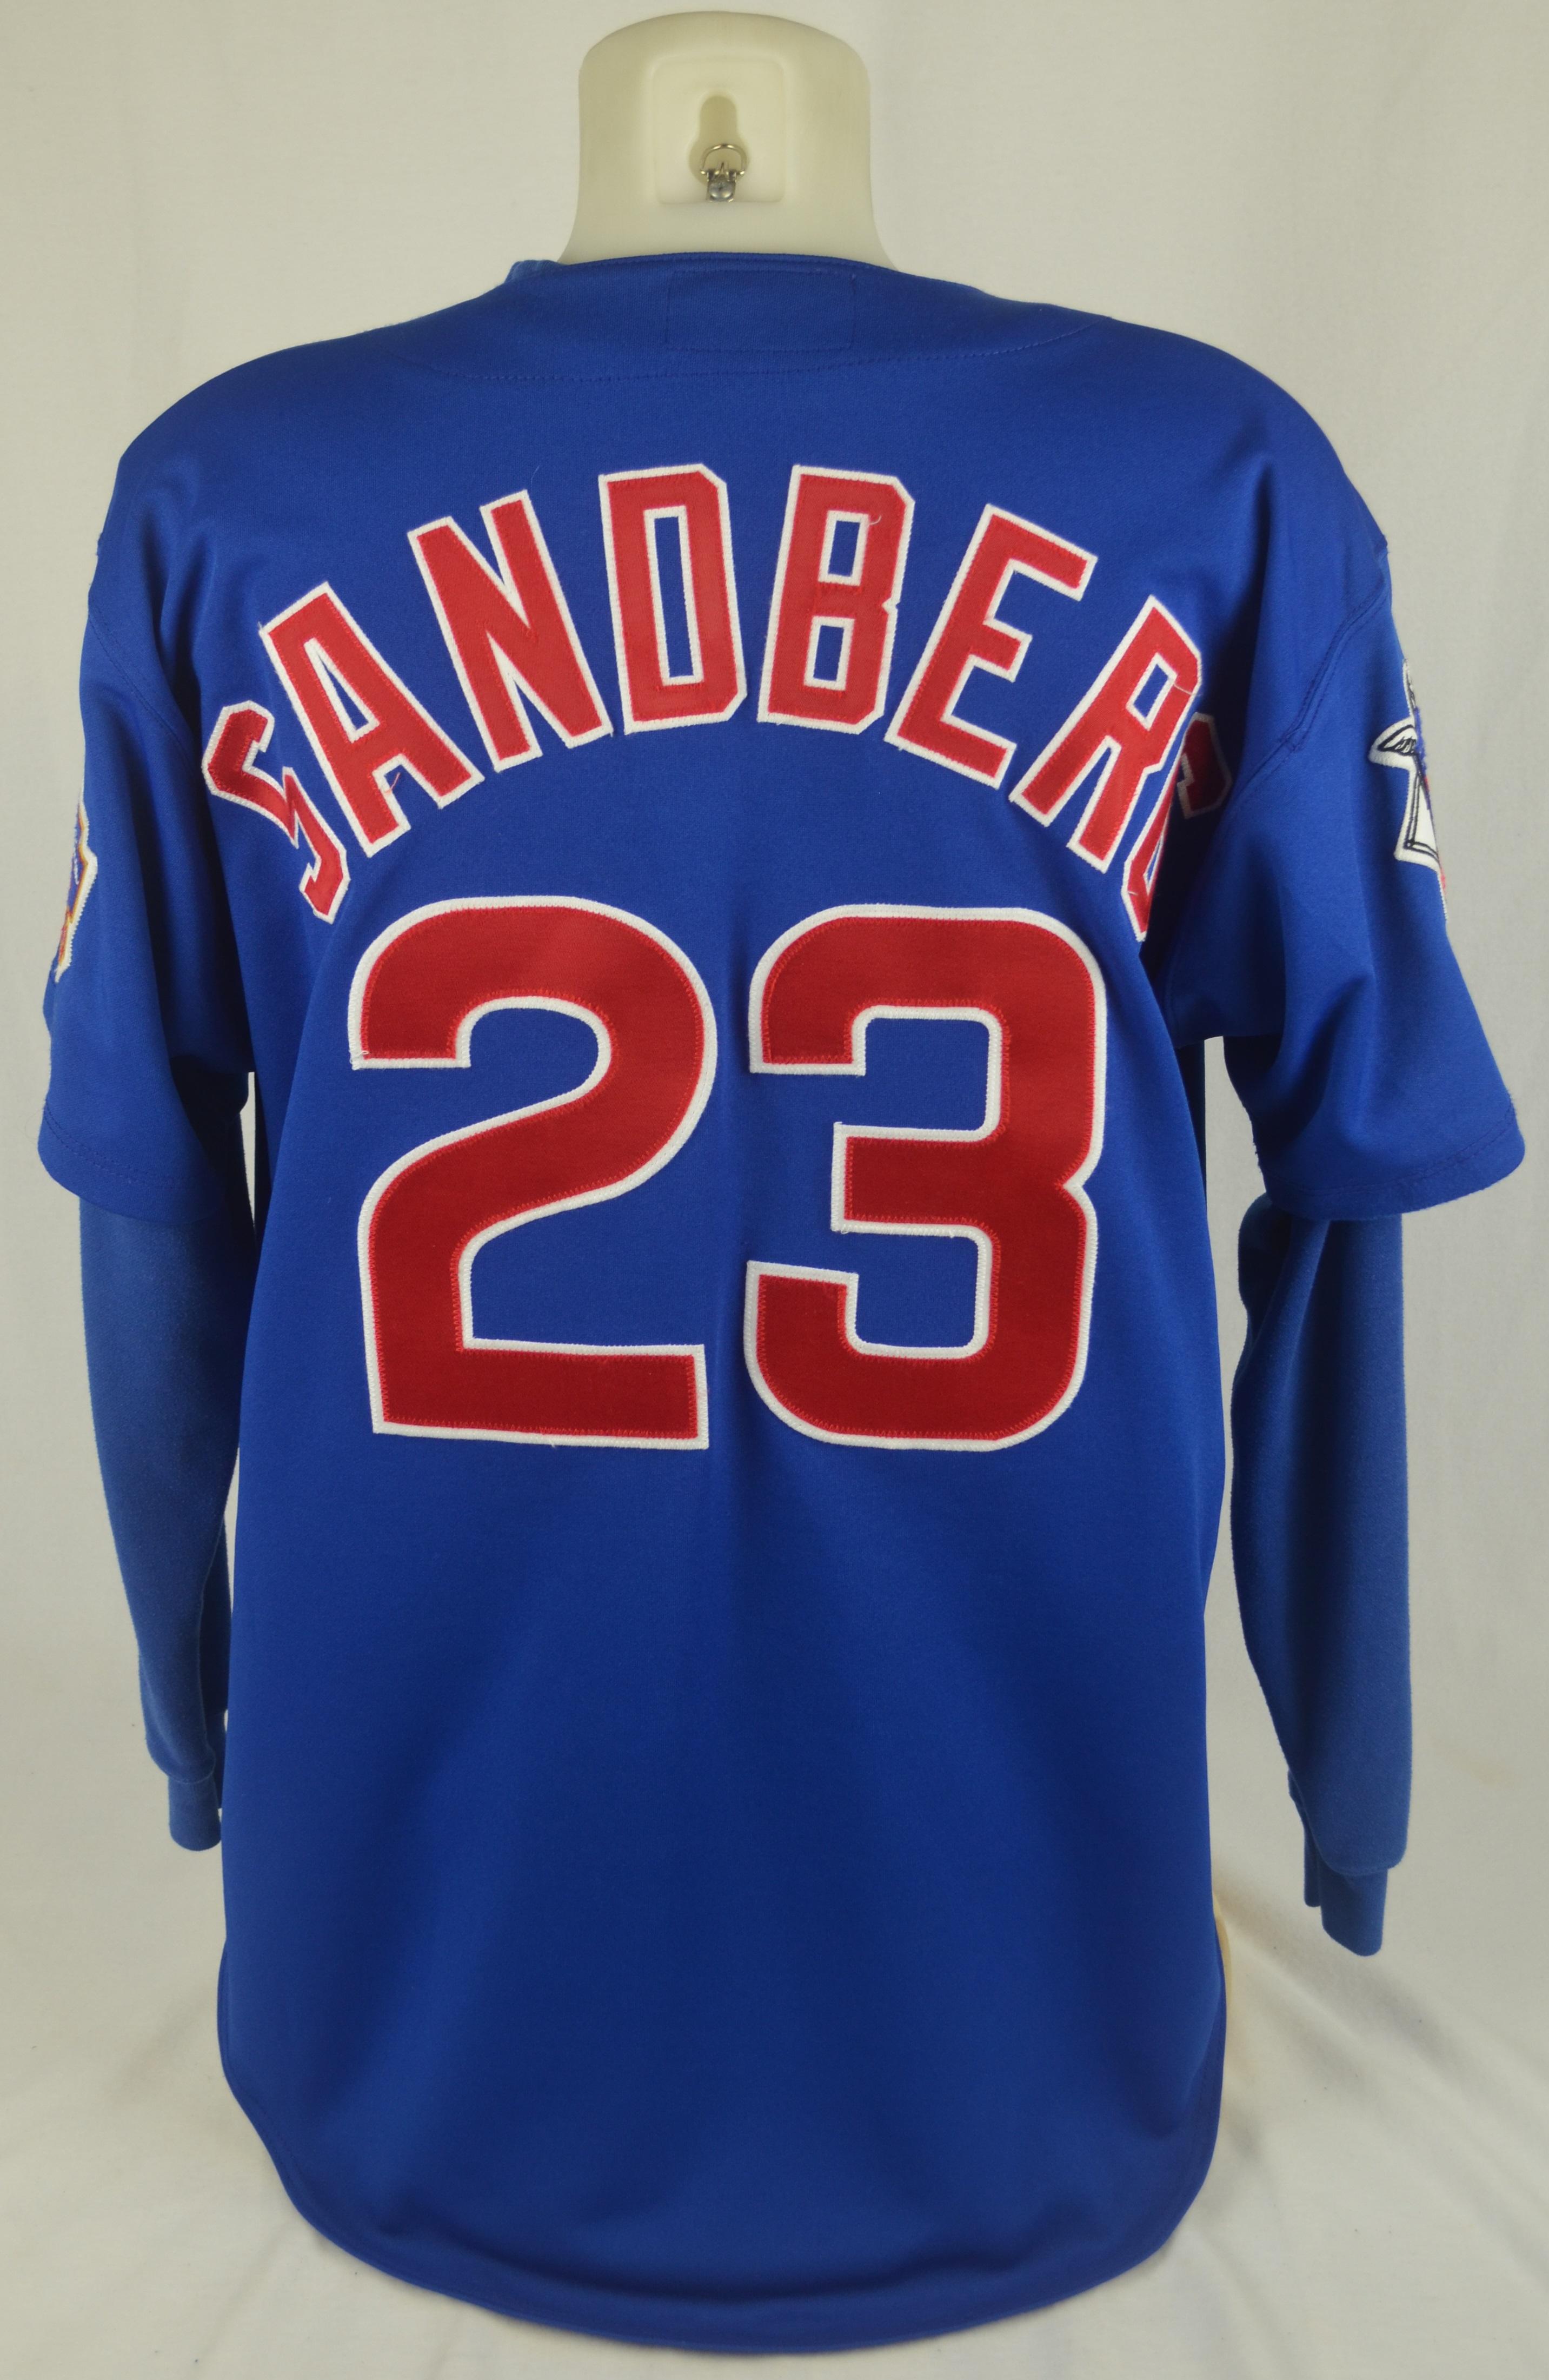 watch 6458c ca7f1 Lot Detail - Ryne Sandberg 1997 Chicago Cubs Game Used ...